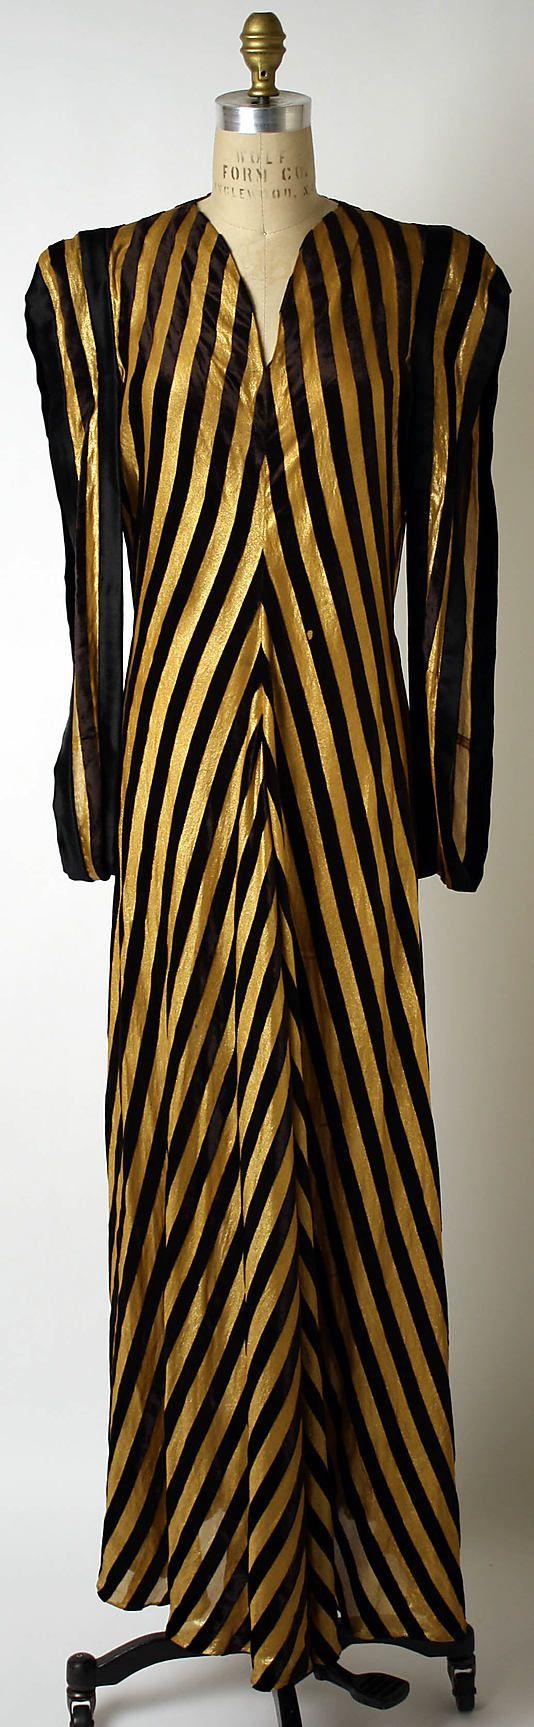 1938 Valentina Evening dress  Metropolitan Museum of Art, see more vintage fashion by decade at http://www.vintagefashionandart.com/dresses